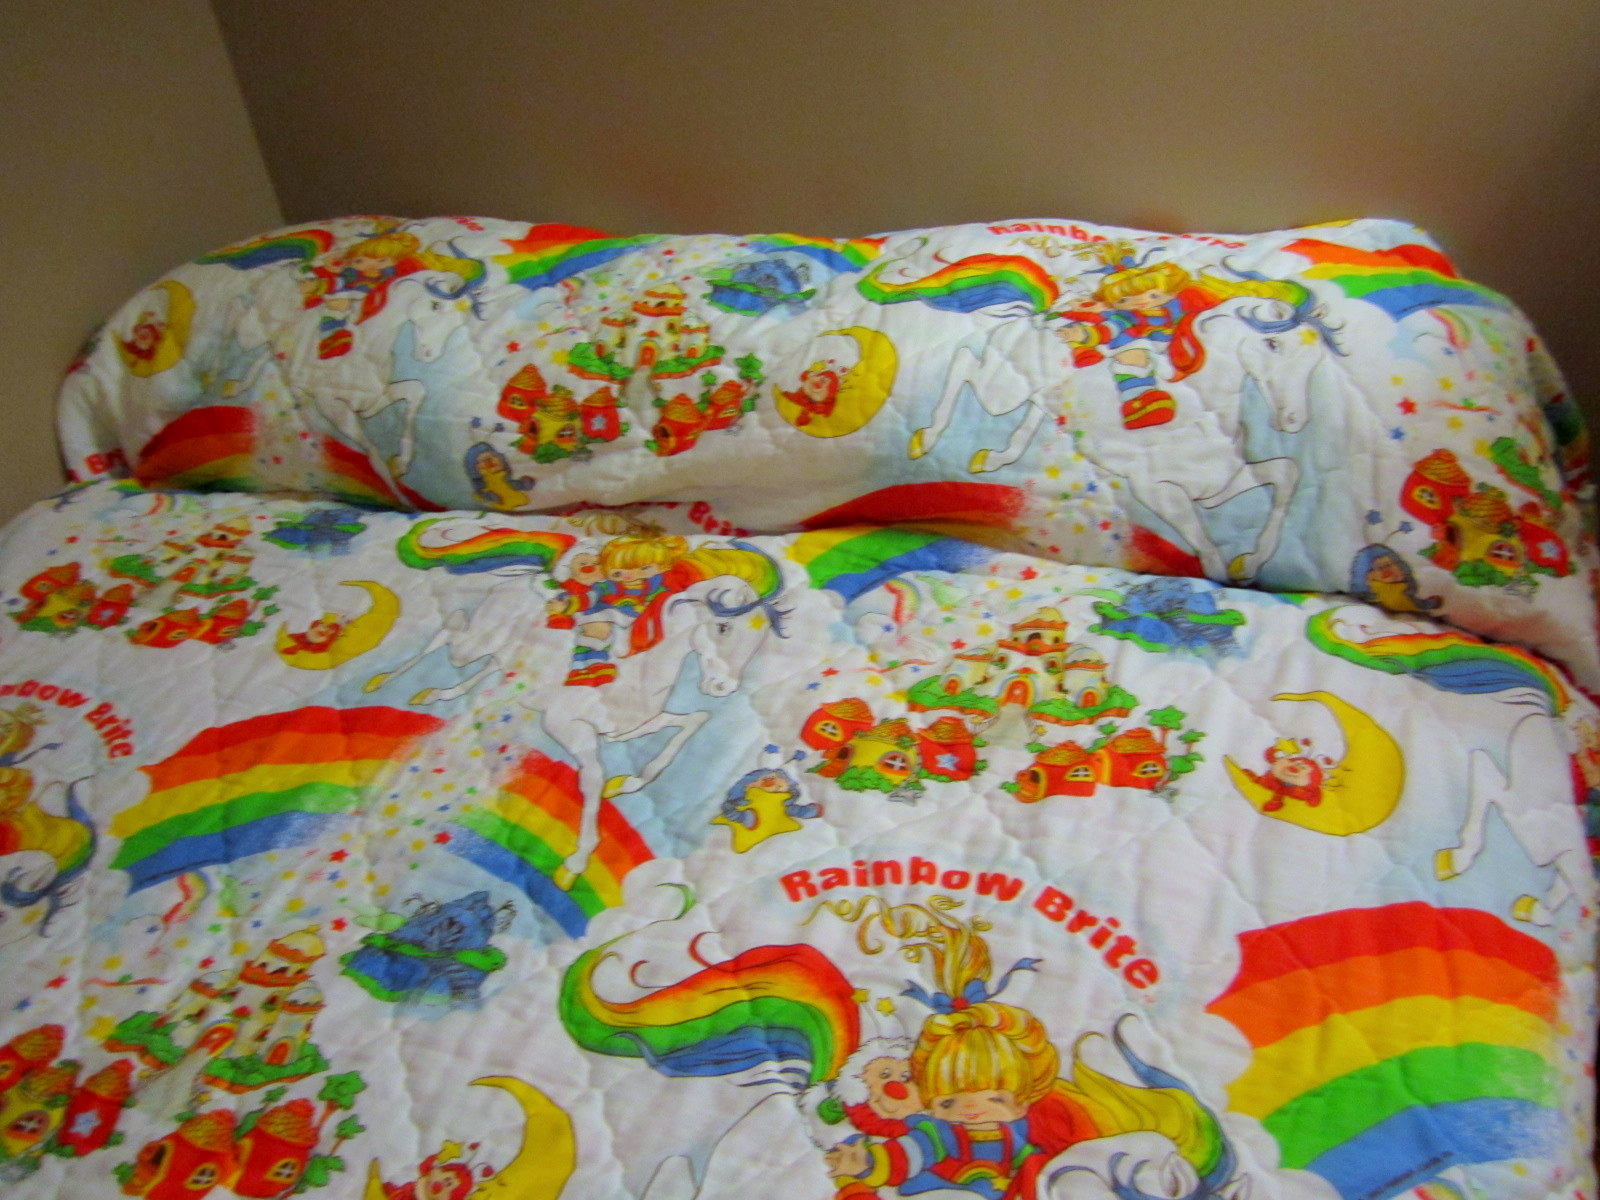 rainbow bright bedding photo - 5